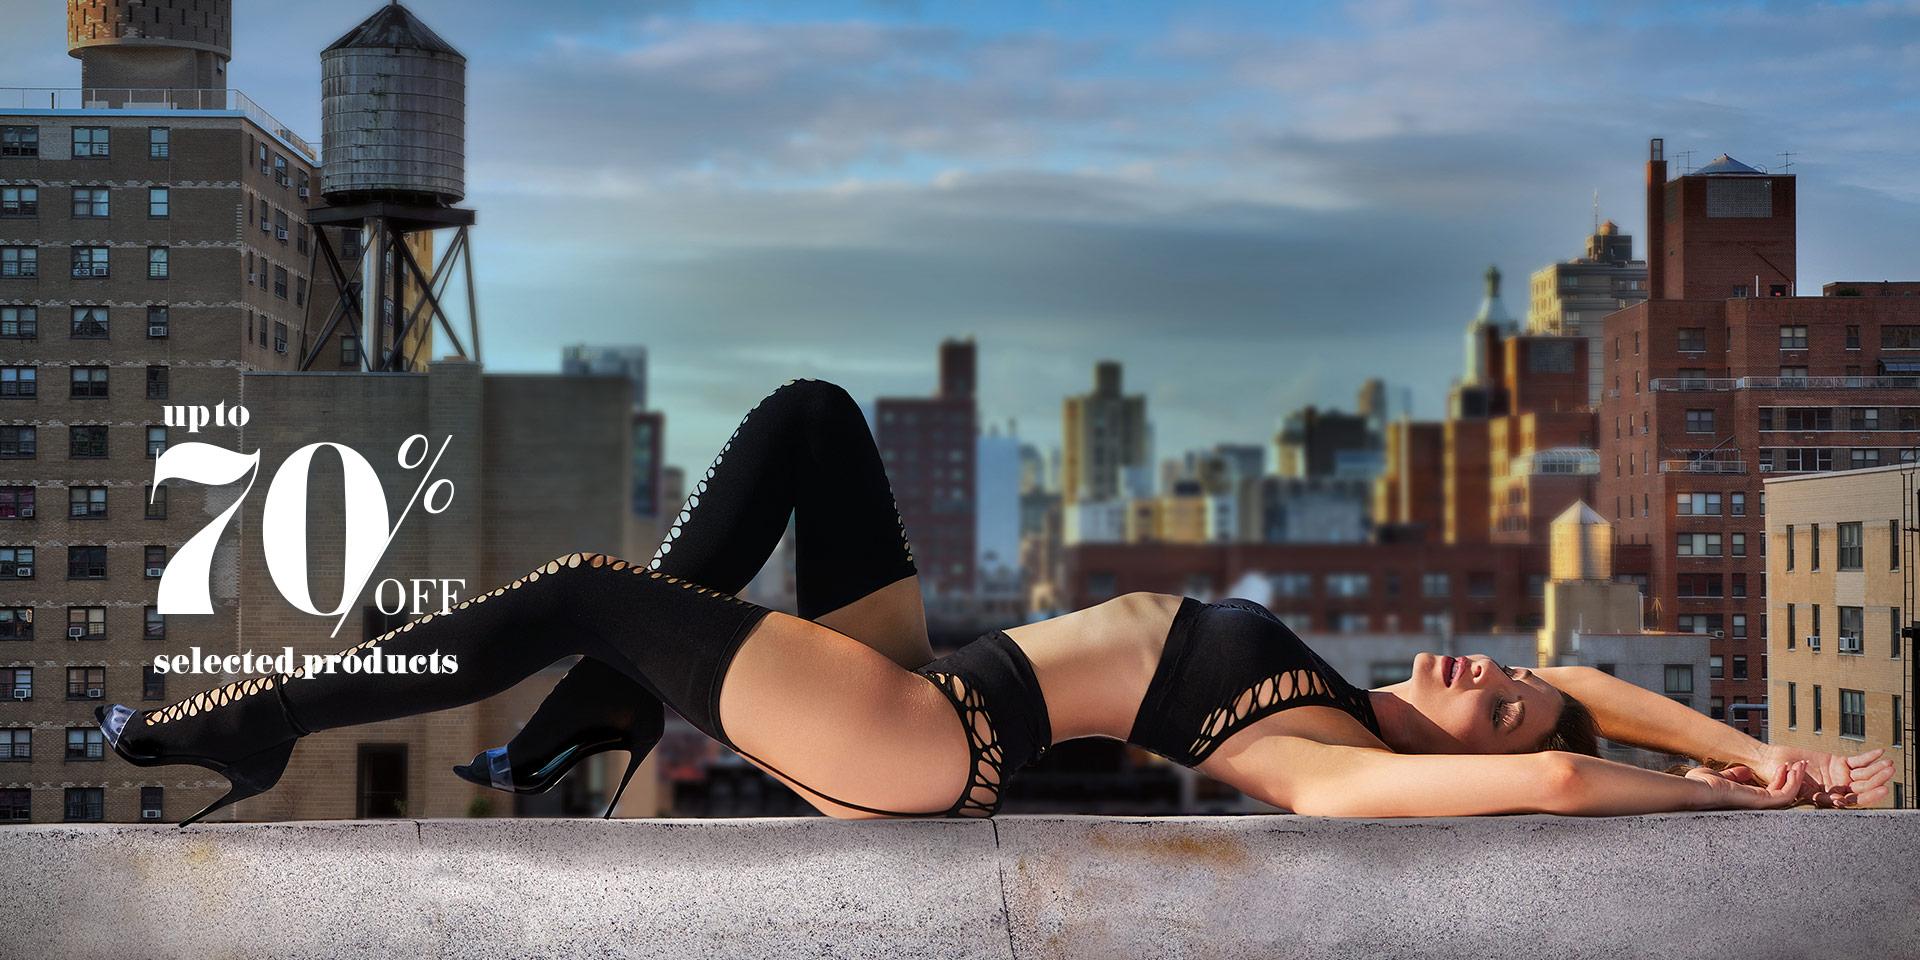 lingerie-sale-banner